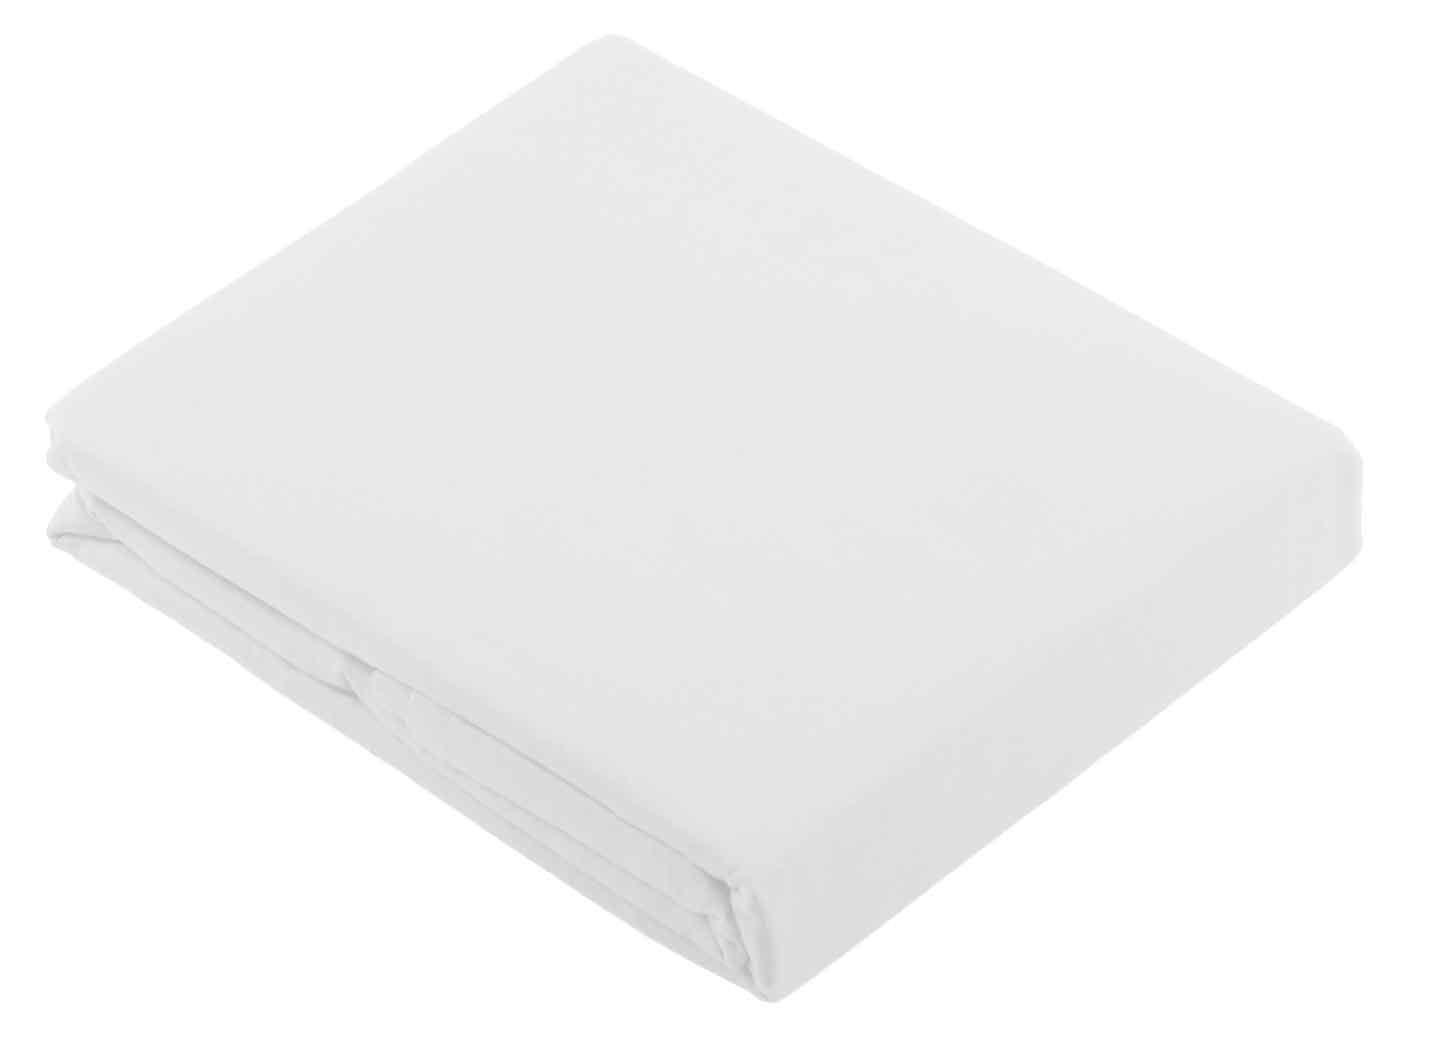 Drap recouvrement ton sur ton 180 x 290 cm blanc (Blanc)